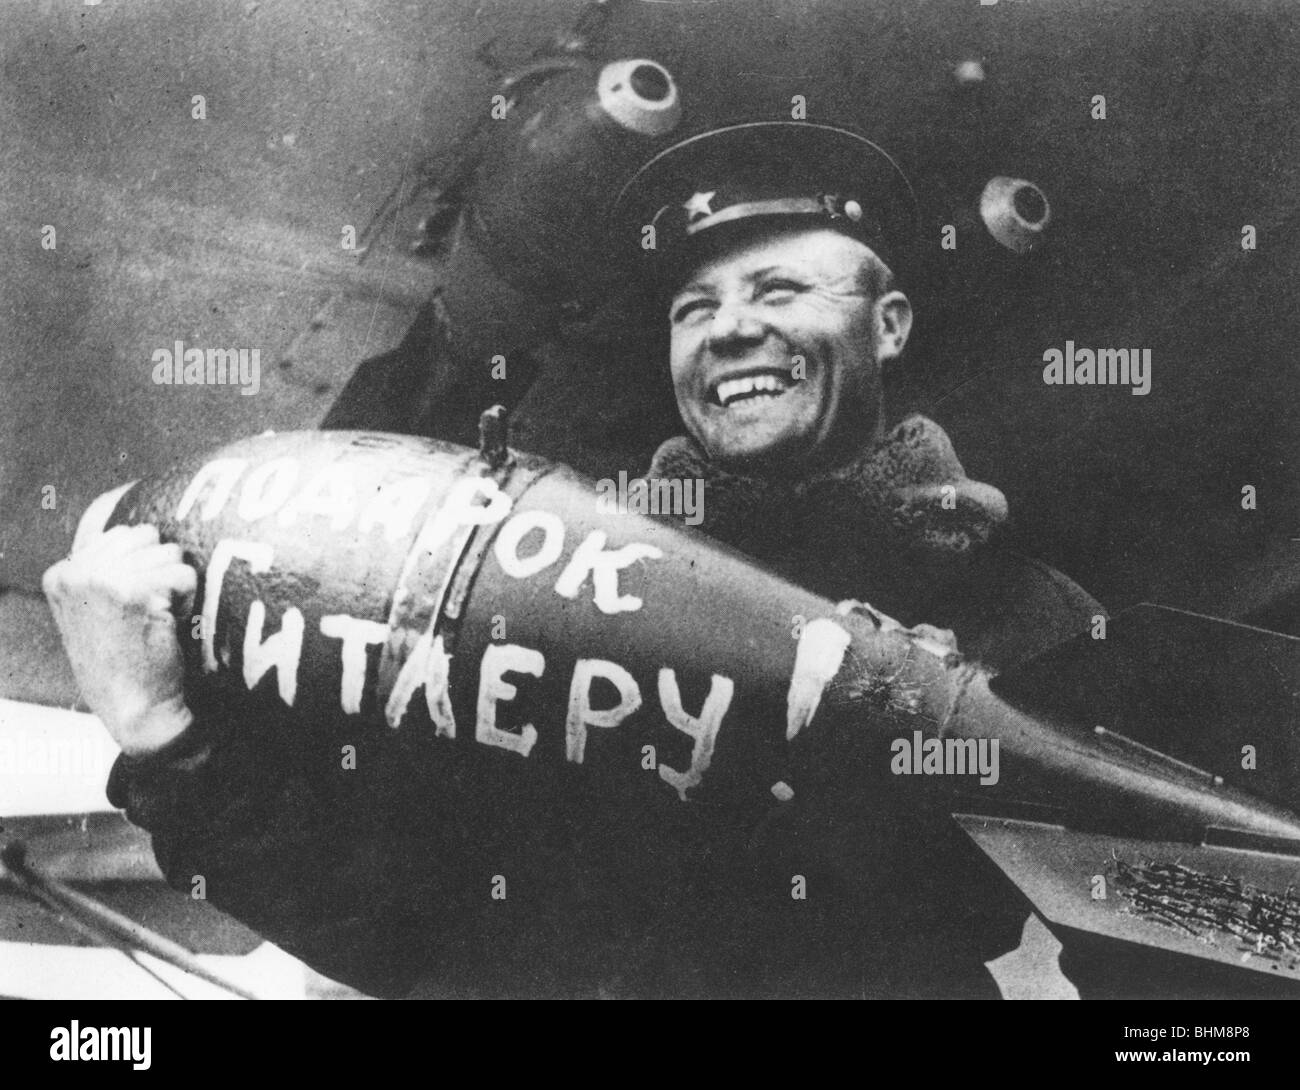 A Present for Hitler', World War II, 1939-1945 Stock Photo ...